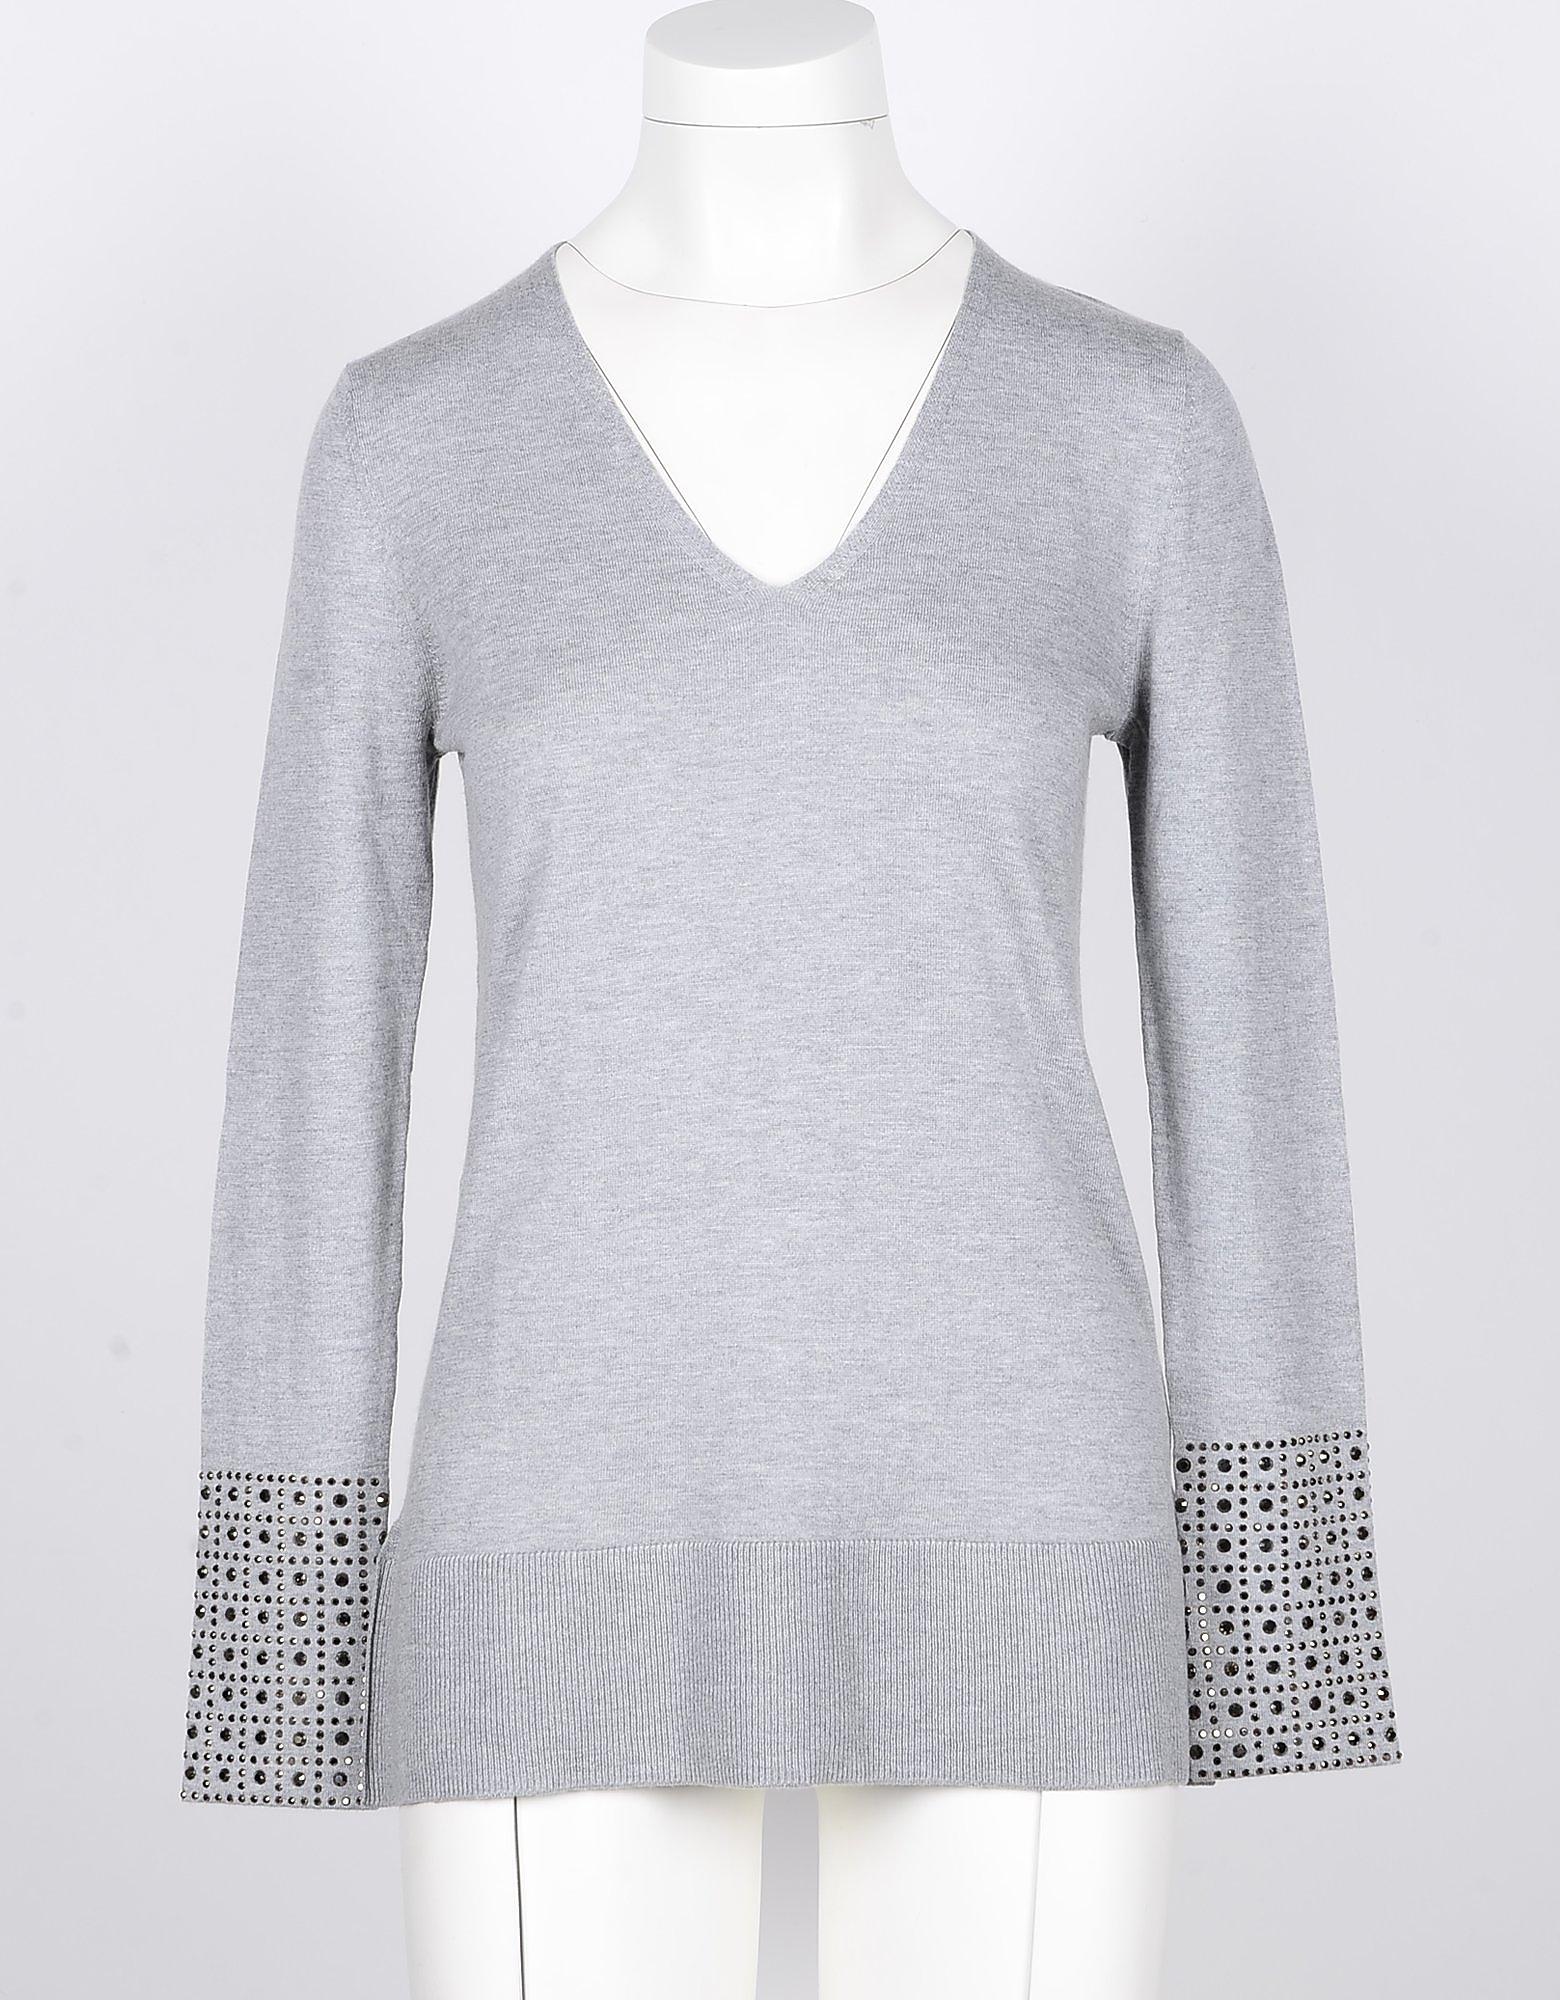 SNOBBY SHEEP Designer Knitwear, Light Gray Silk & Cashmere Women's V-Neck Sweater w/Crystals